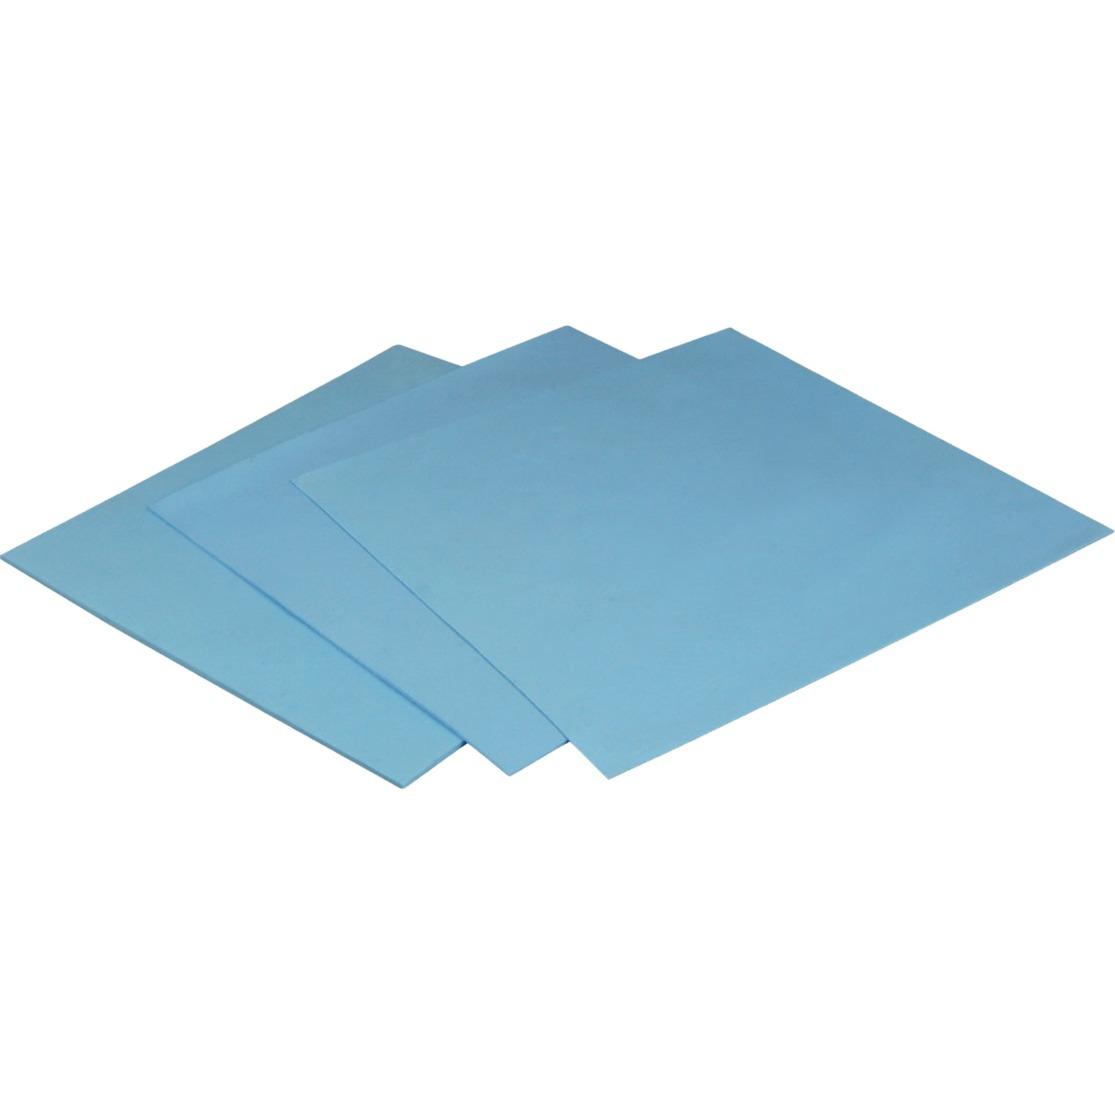 ACTPD00002A Azul hardware accesorio de refrigeración, Conductores térmicos (grasa/disco)